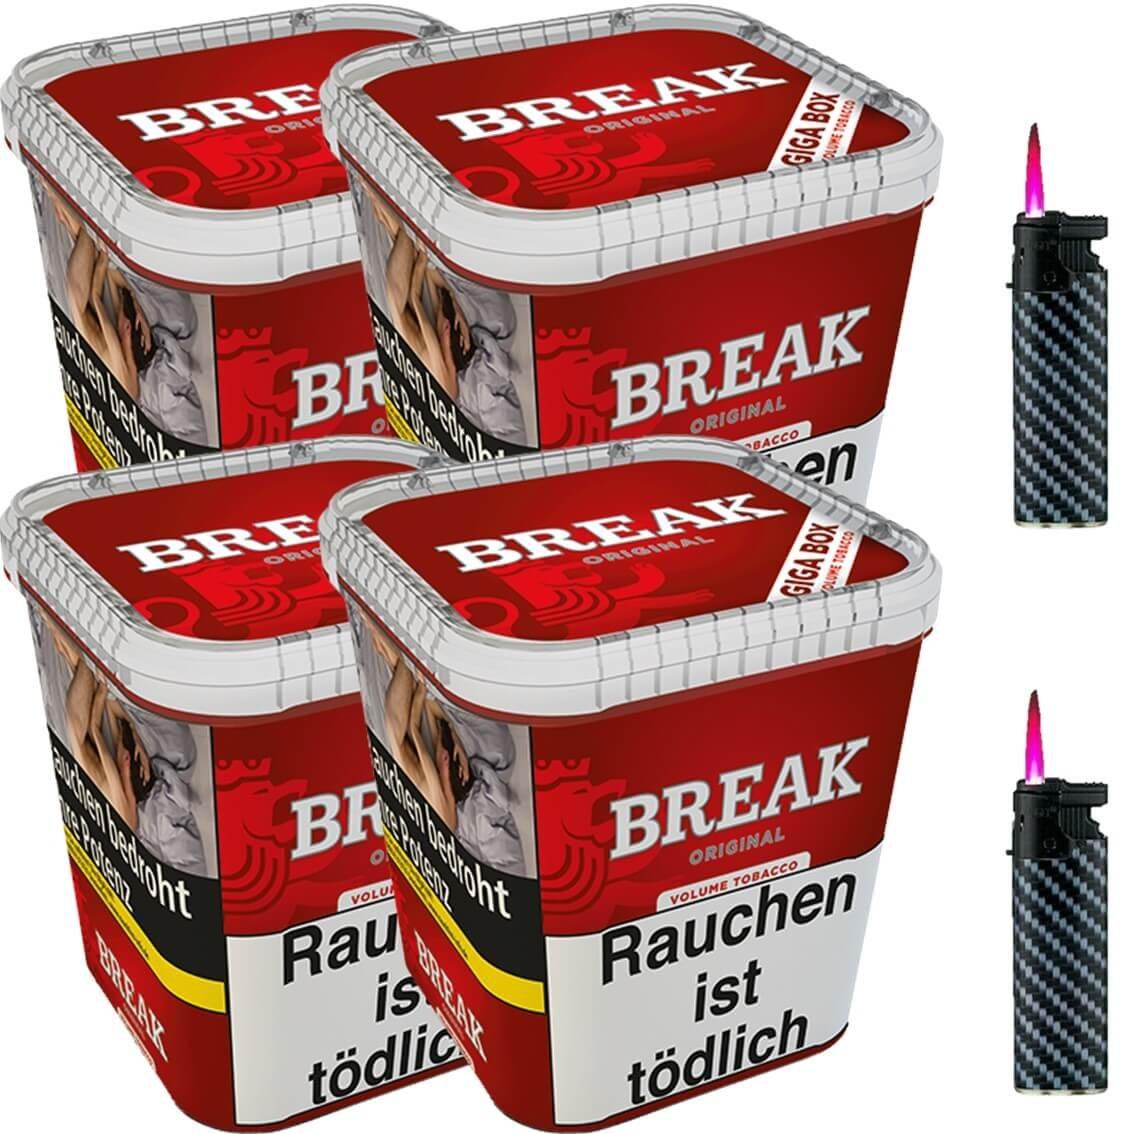 Break Original 4 x 230g Volumentabak 2 x Sturmfeuerzeuge